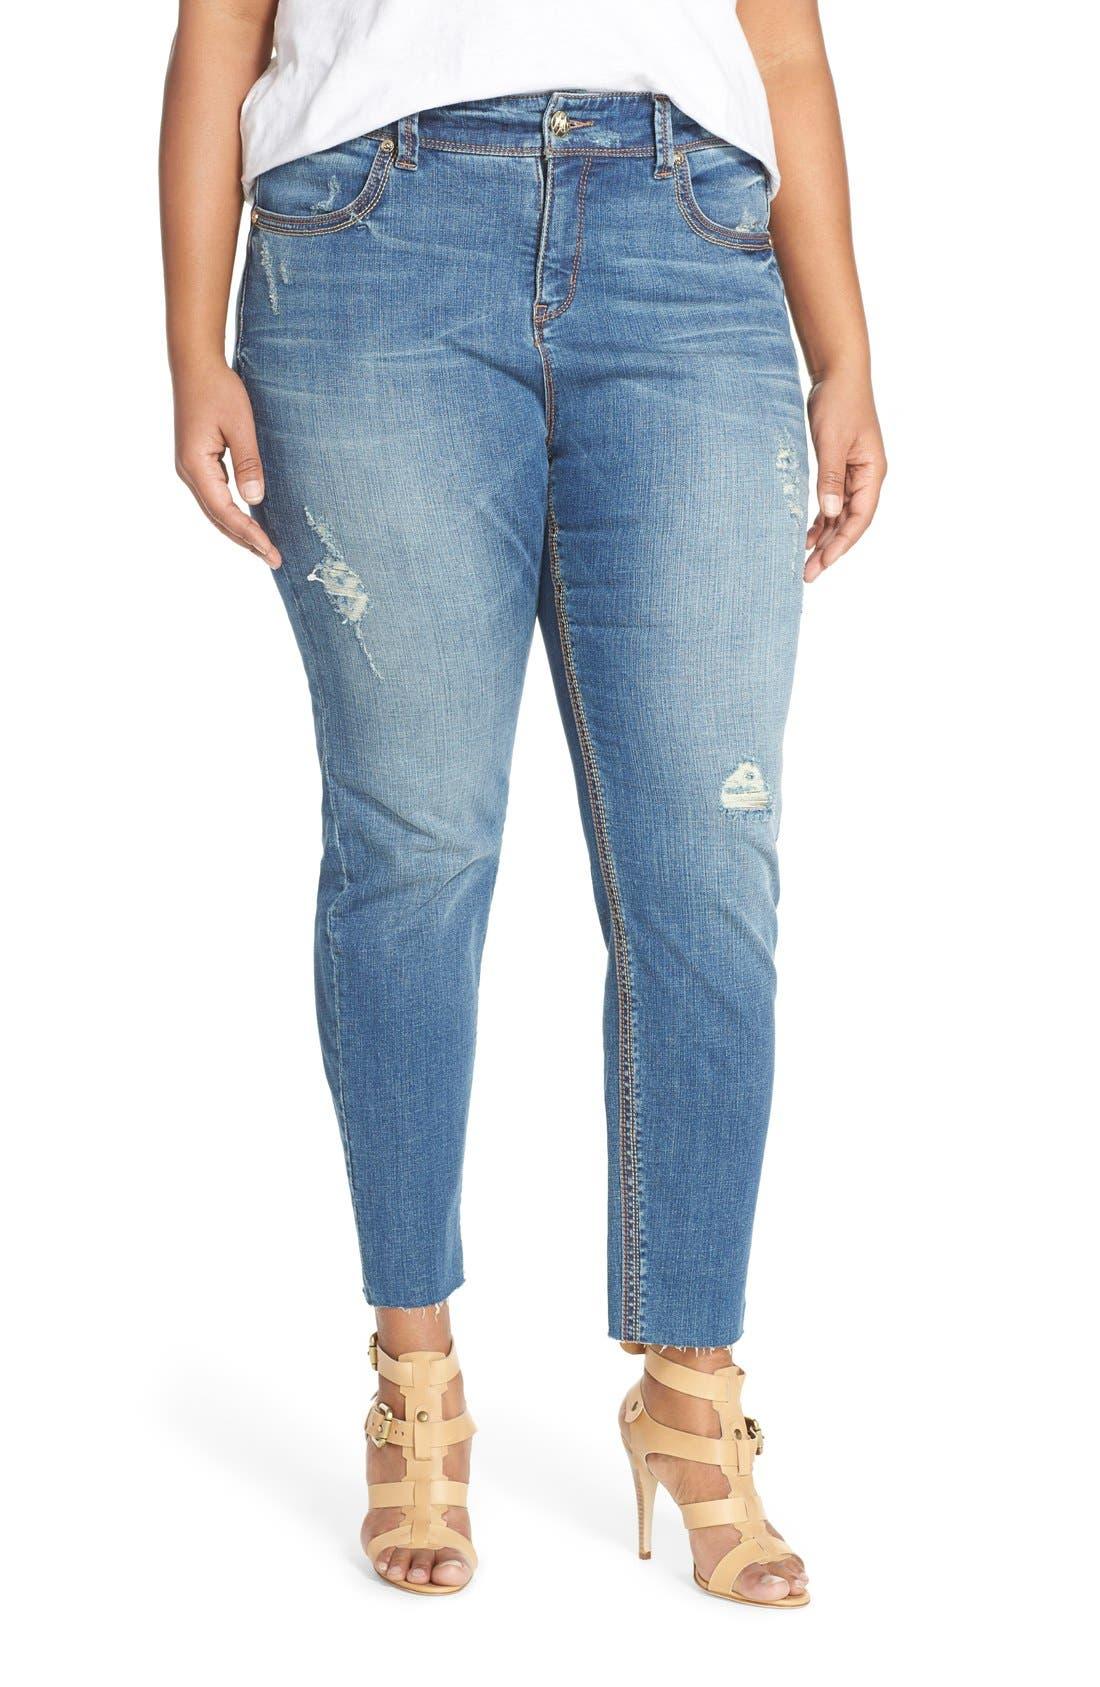 Alternate Image 1 Selected - Melissa McCarthy Seven7 Distressed Pencil Leg Jeans (Nantucket) (Plus Size)